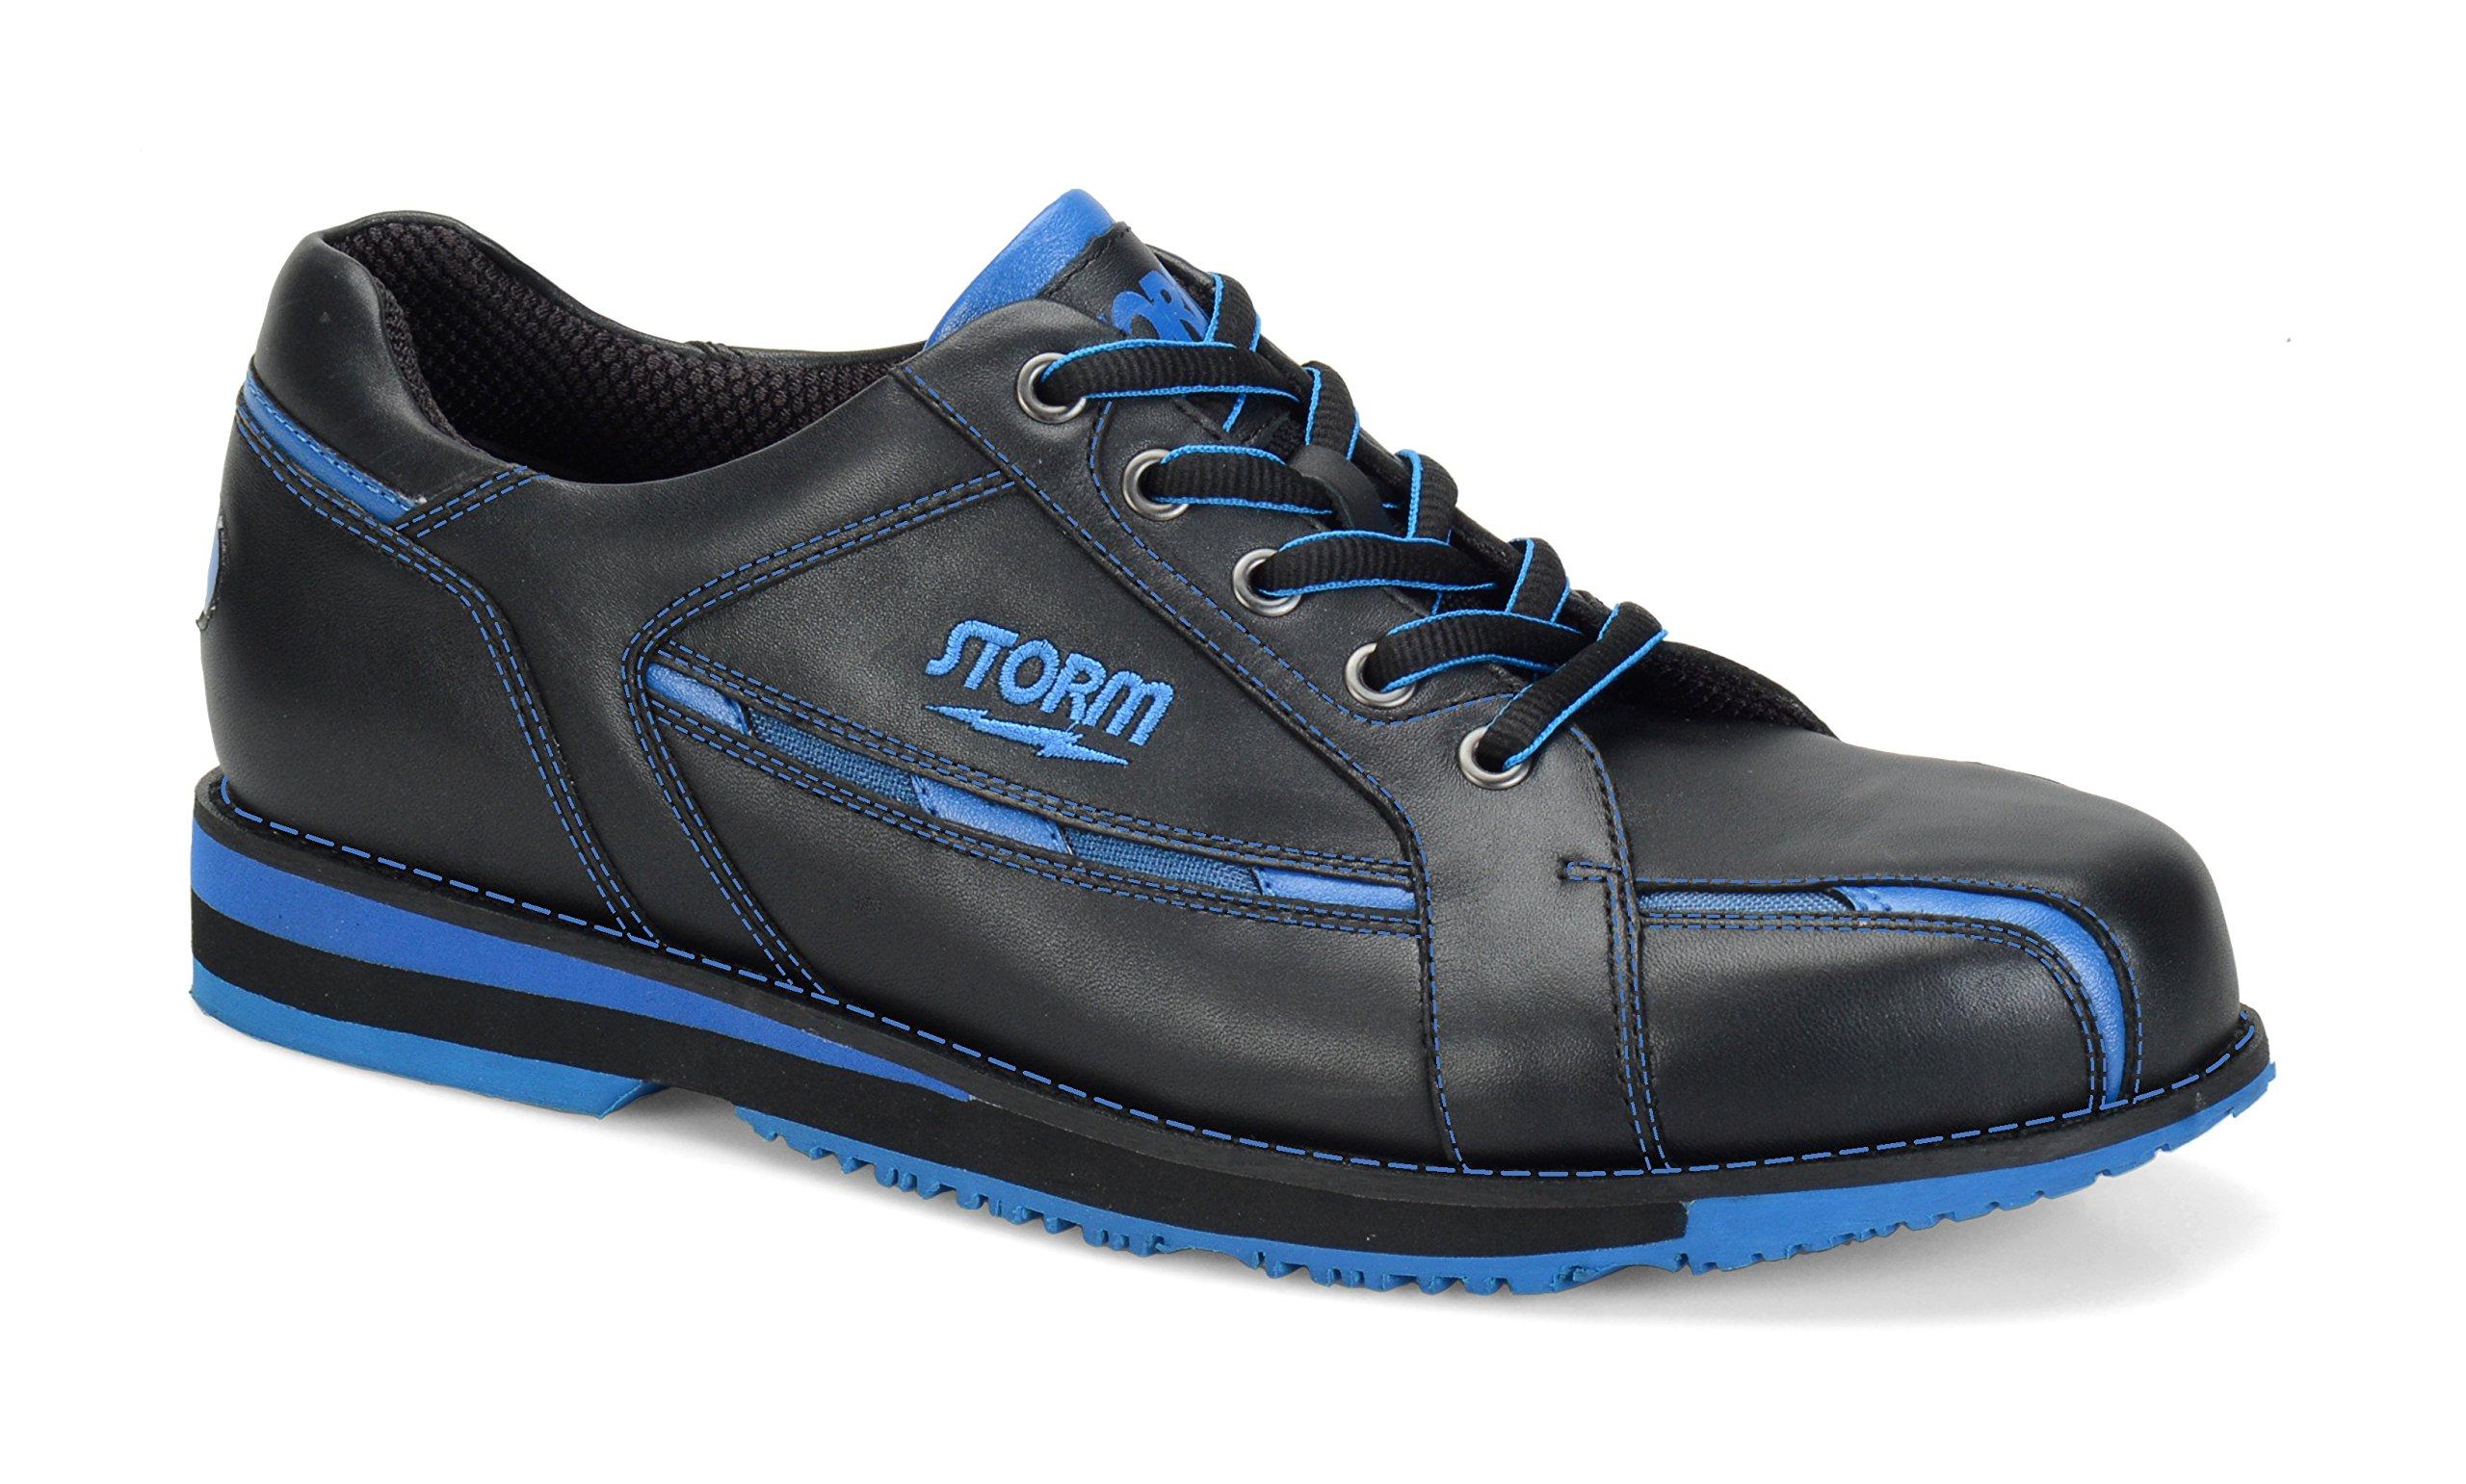 Storm SP800 Bowling Shoes, Black/Blue, 14.0 by Storm